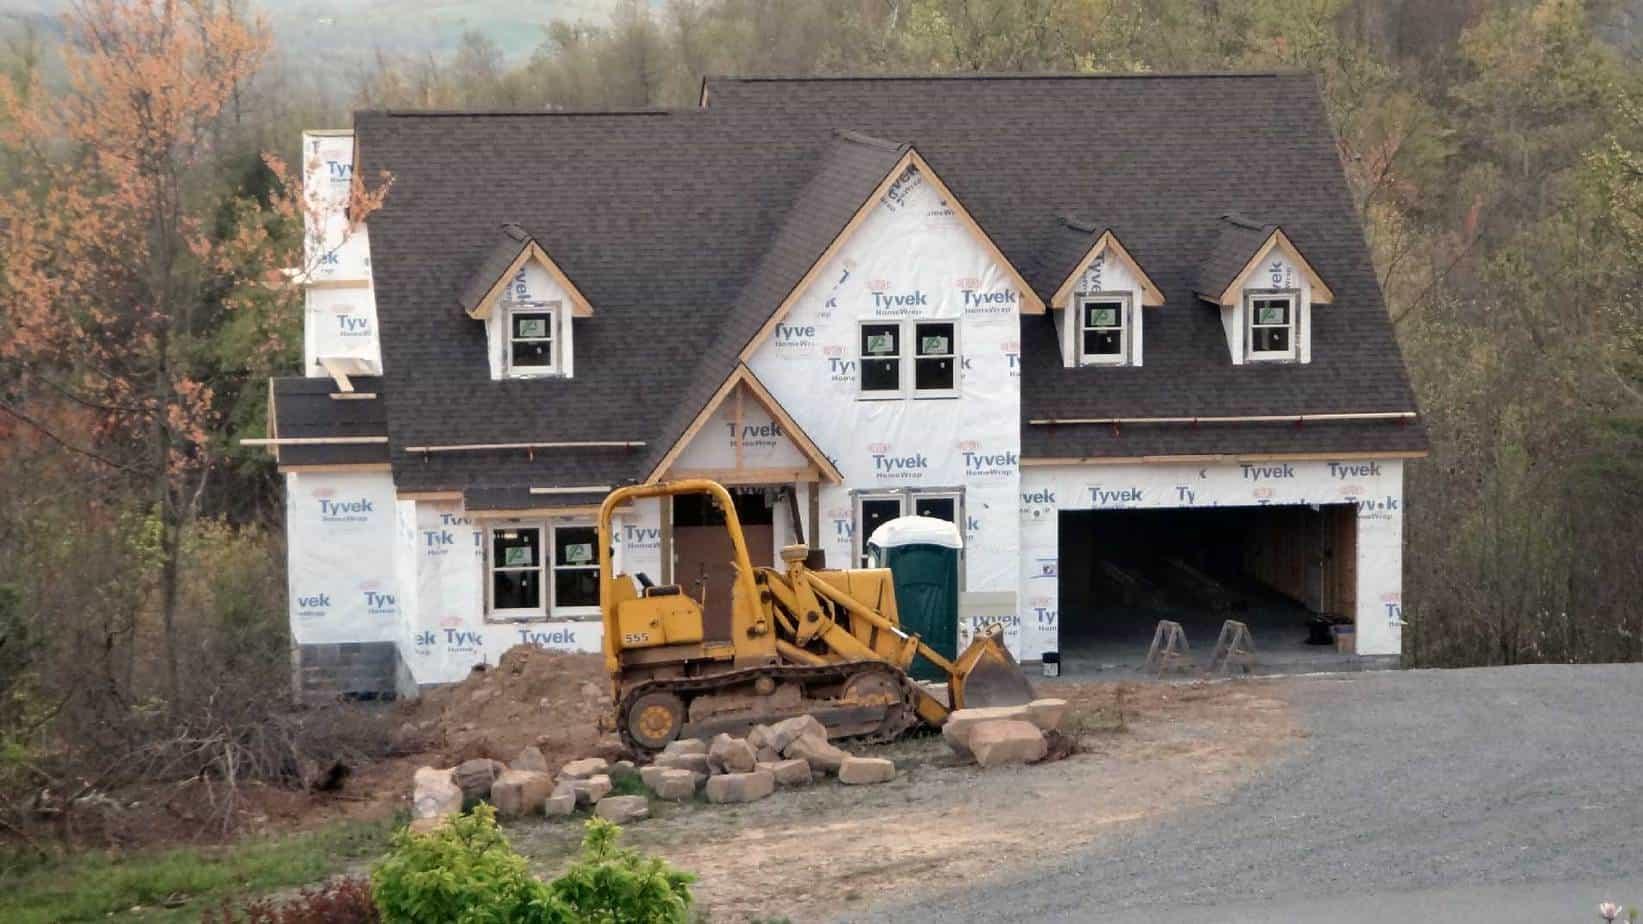 Easy House Renovation - UK Property Cash Buyers